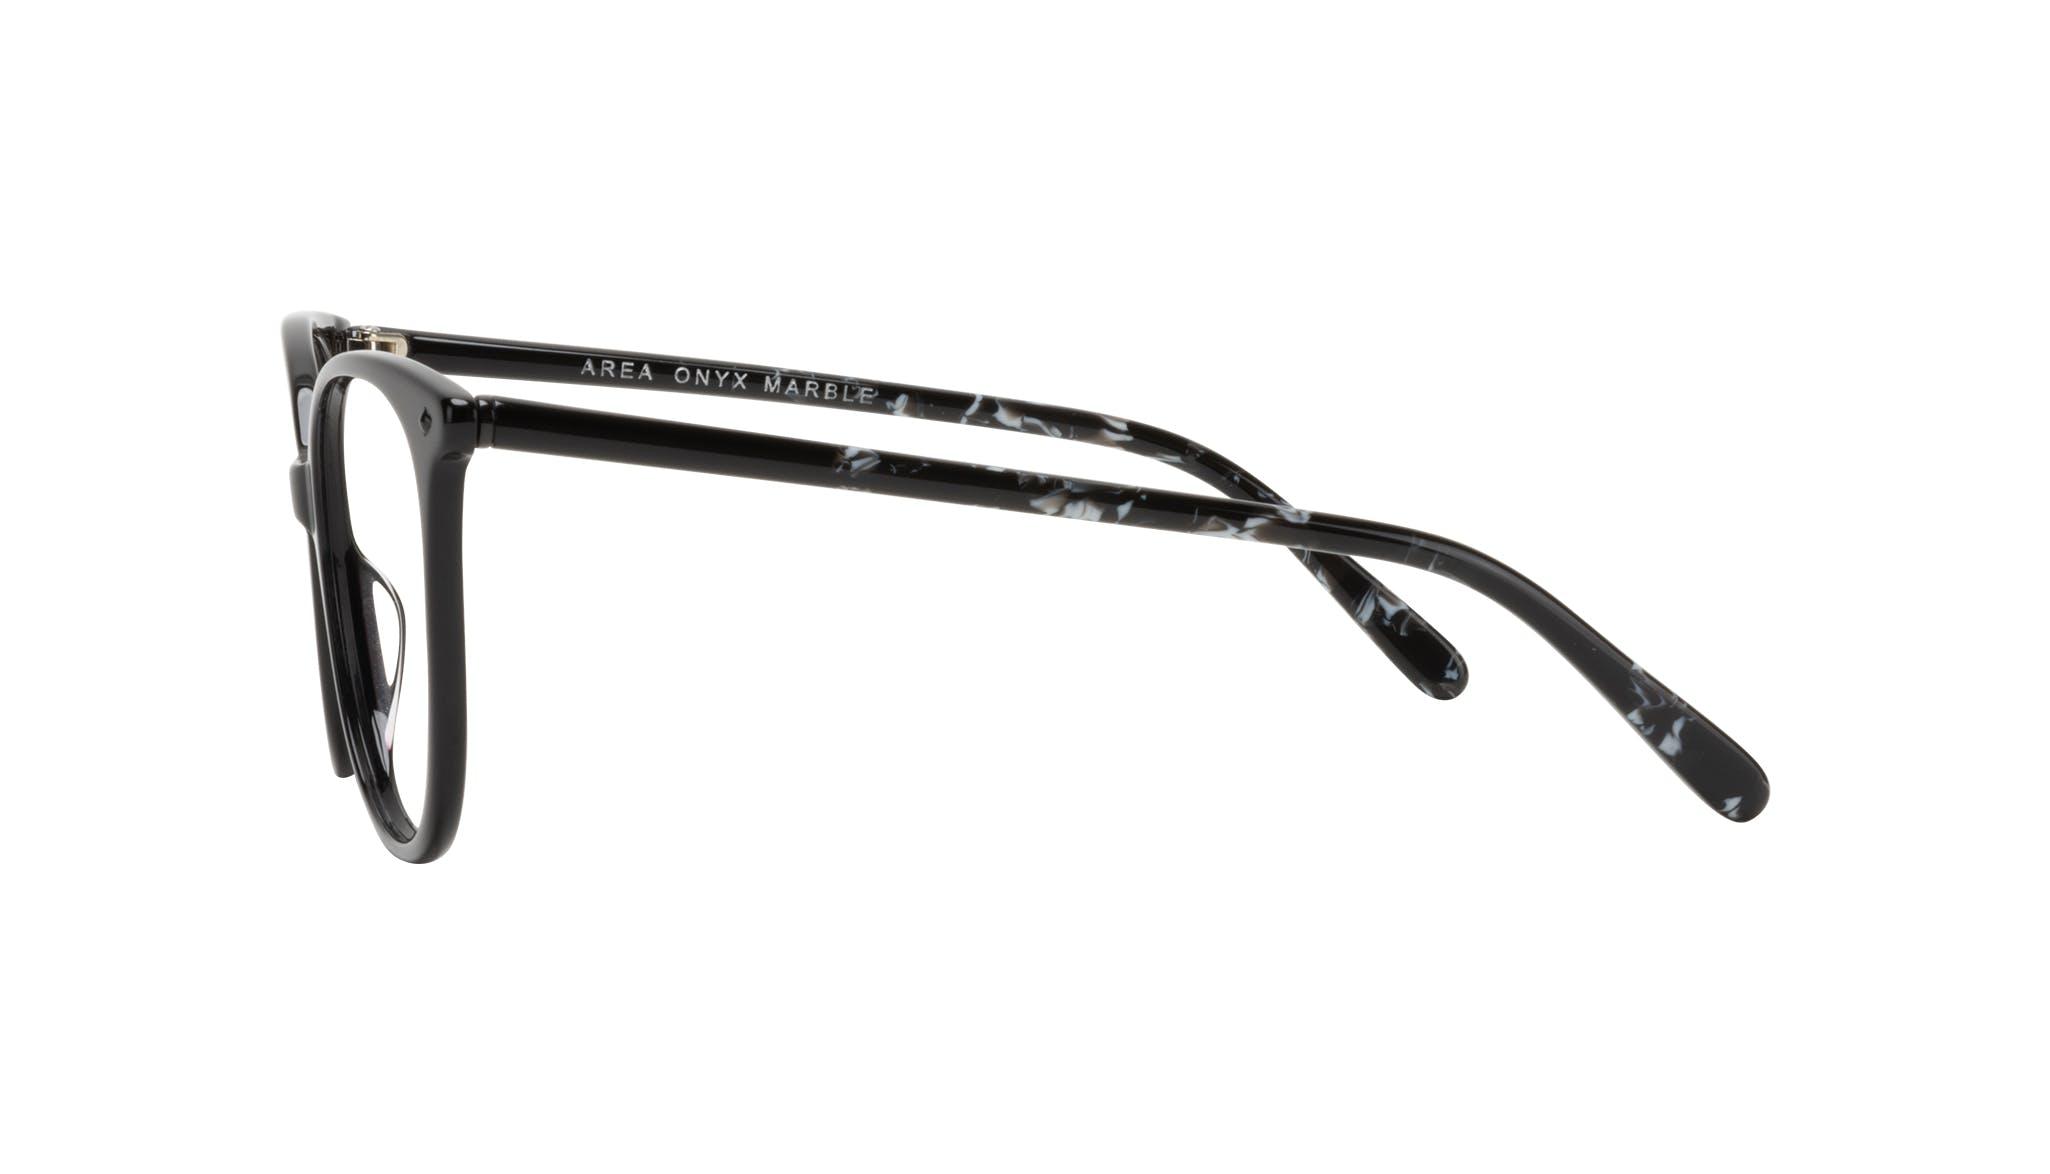 Affordable Fashion Glasses Round Eyeglasses Women Area Onyx Marble Side